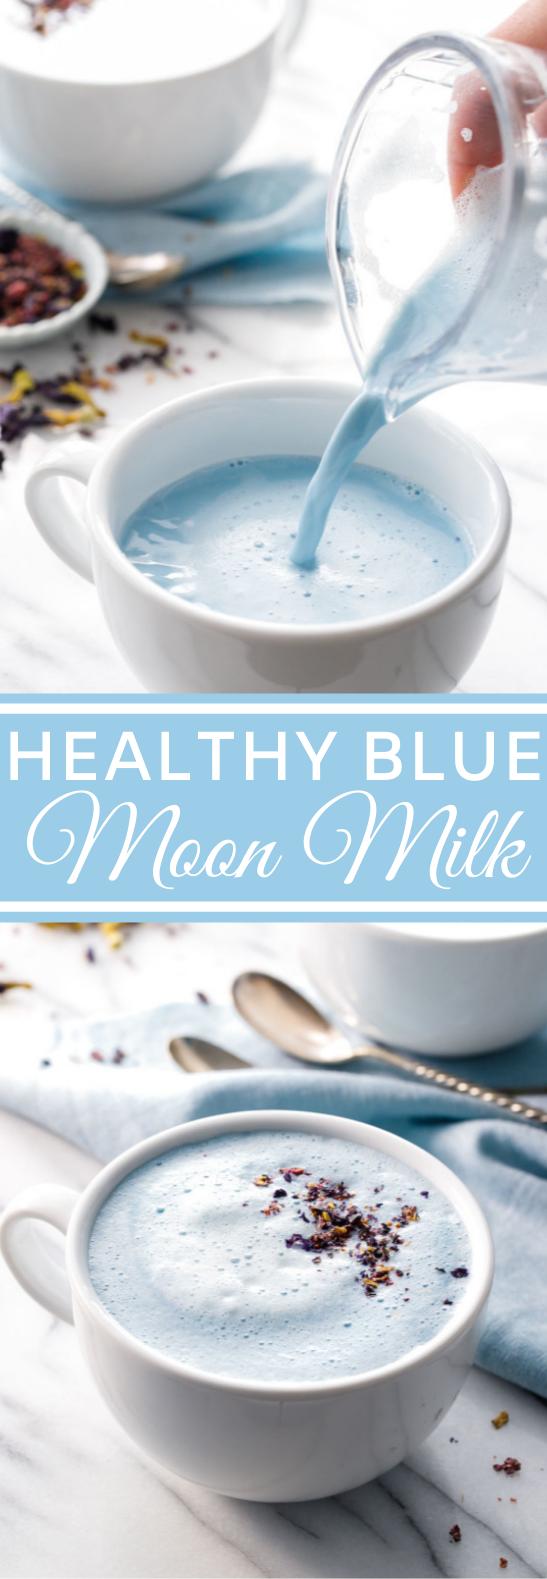 Blue Moon Milk #healthy #drinks #milk #warm #beverages